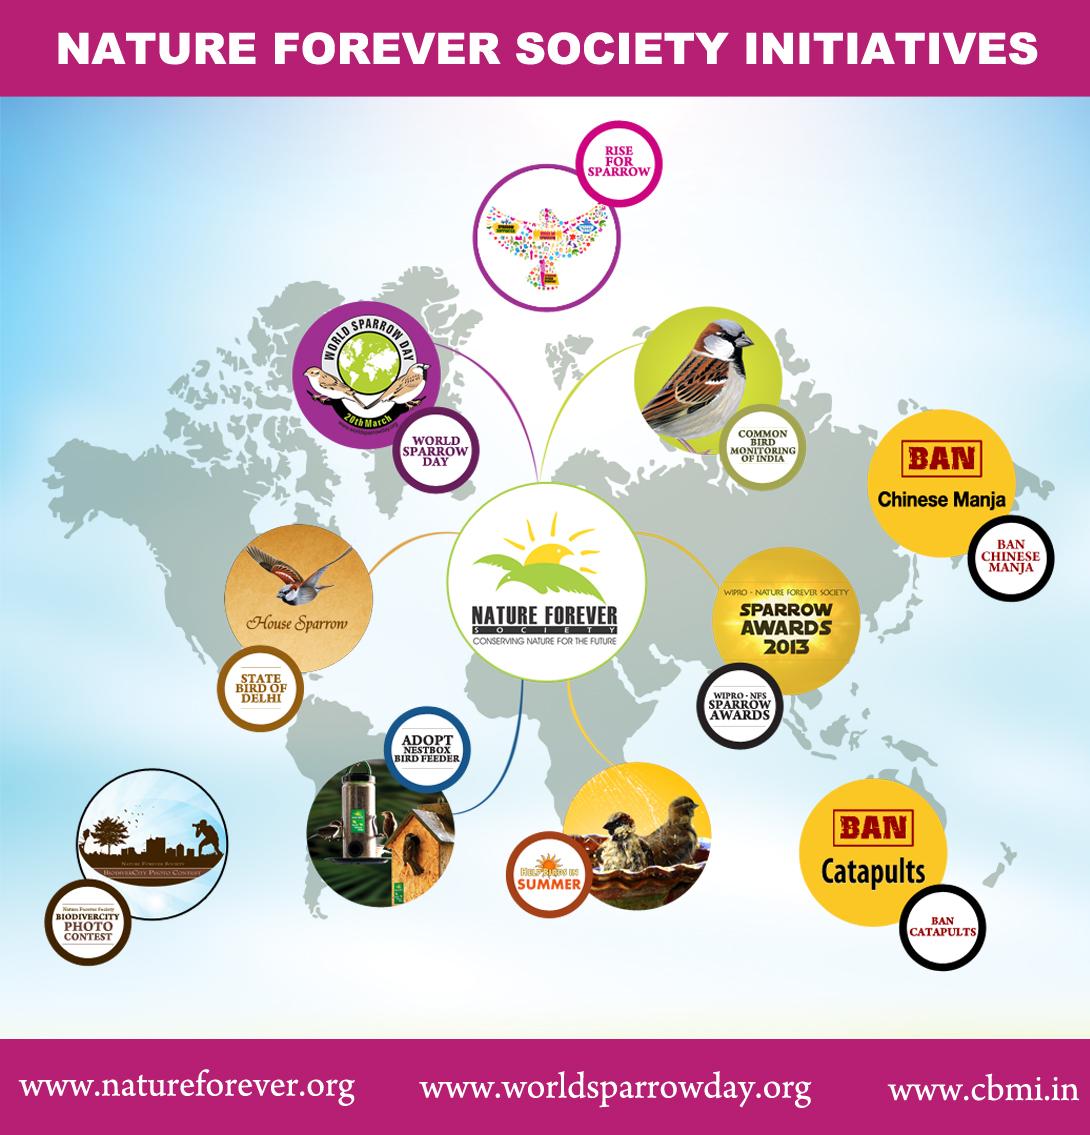 NFS initiatives